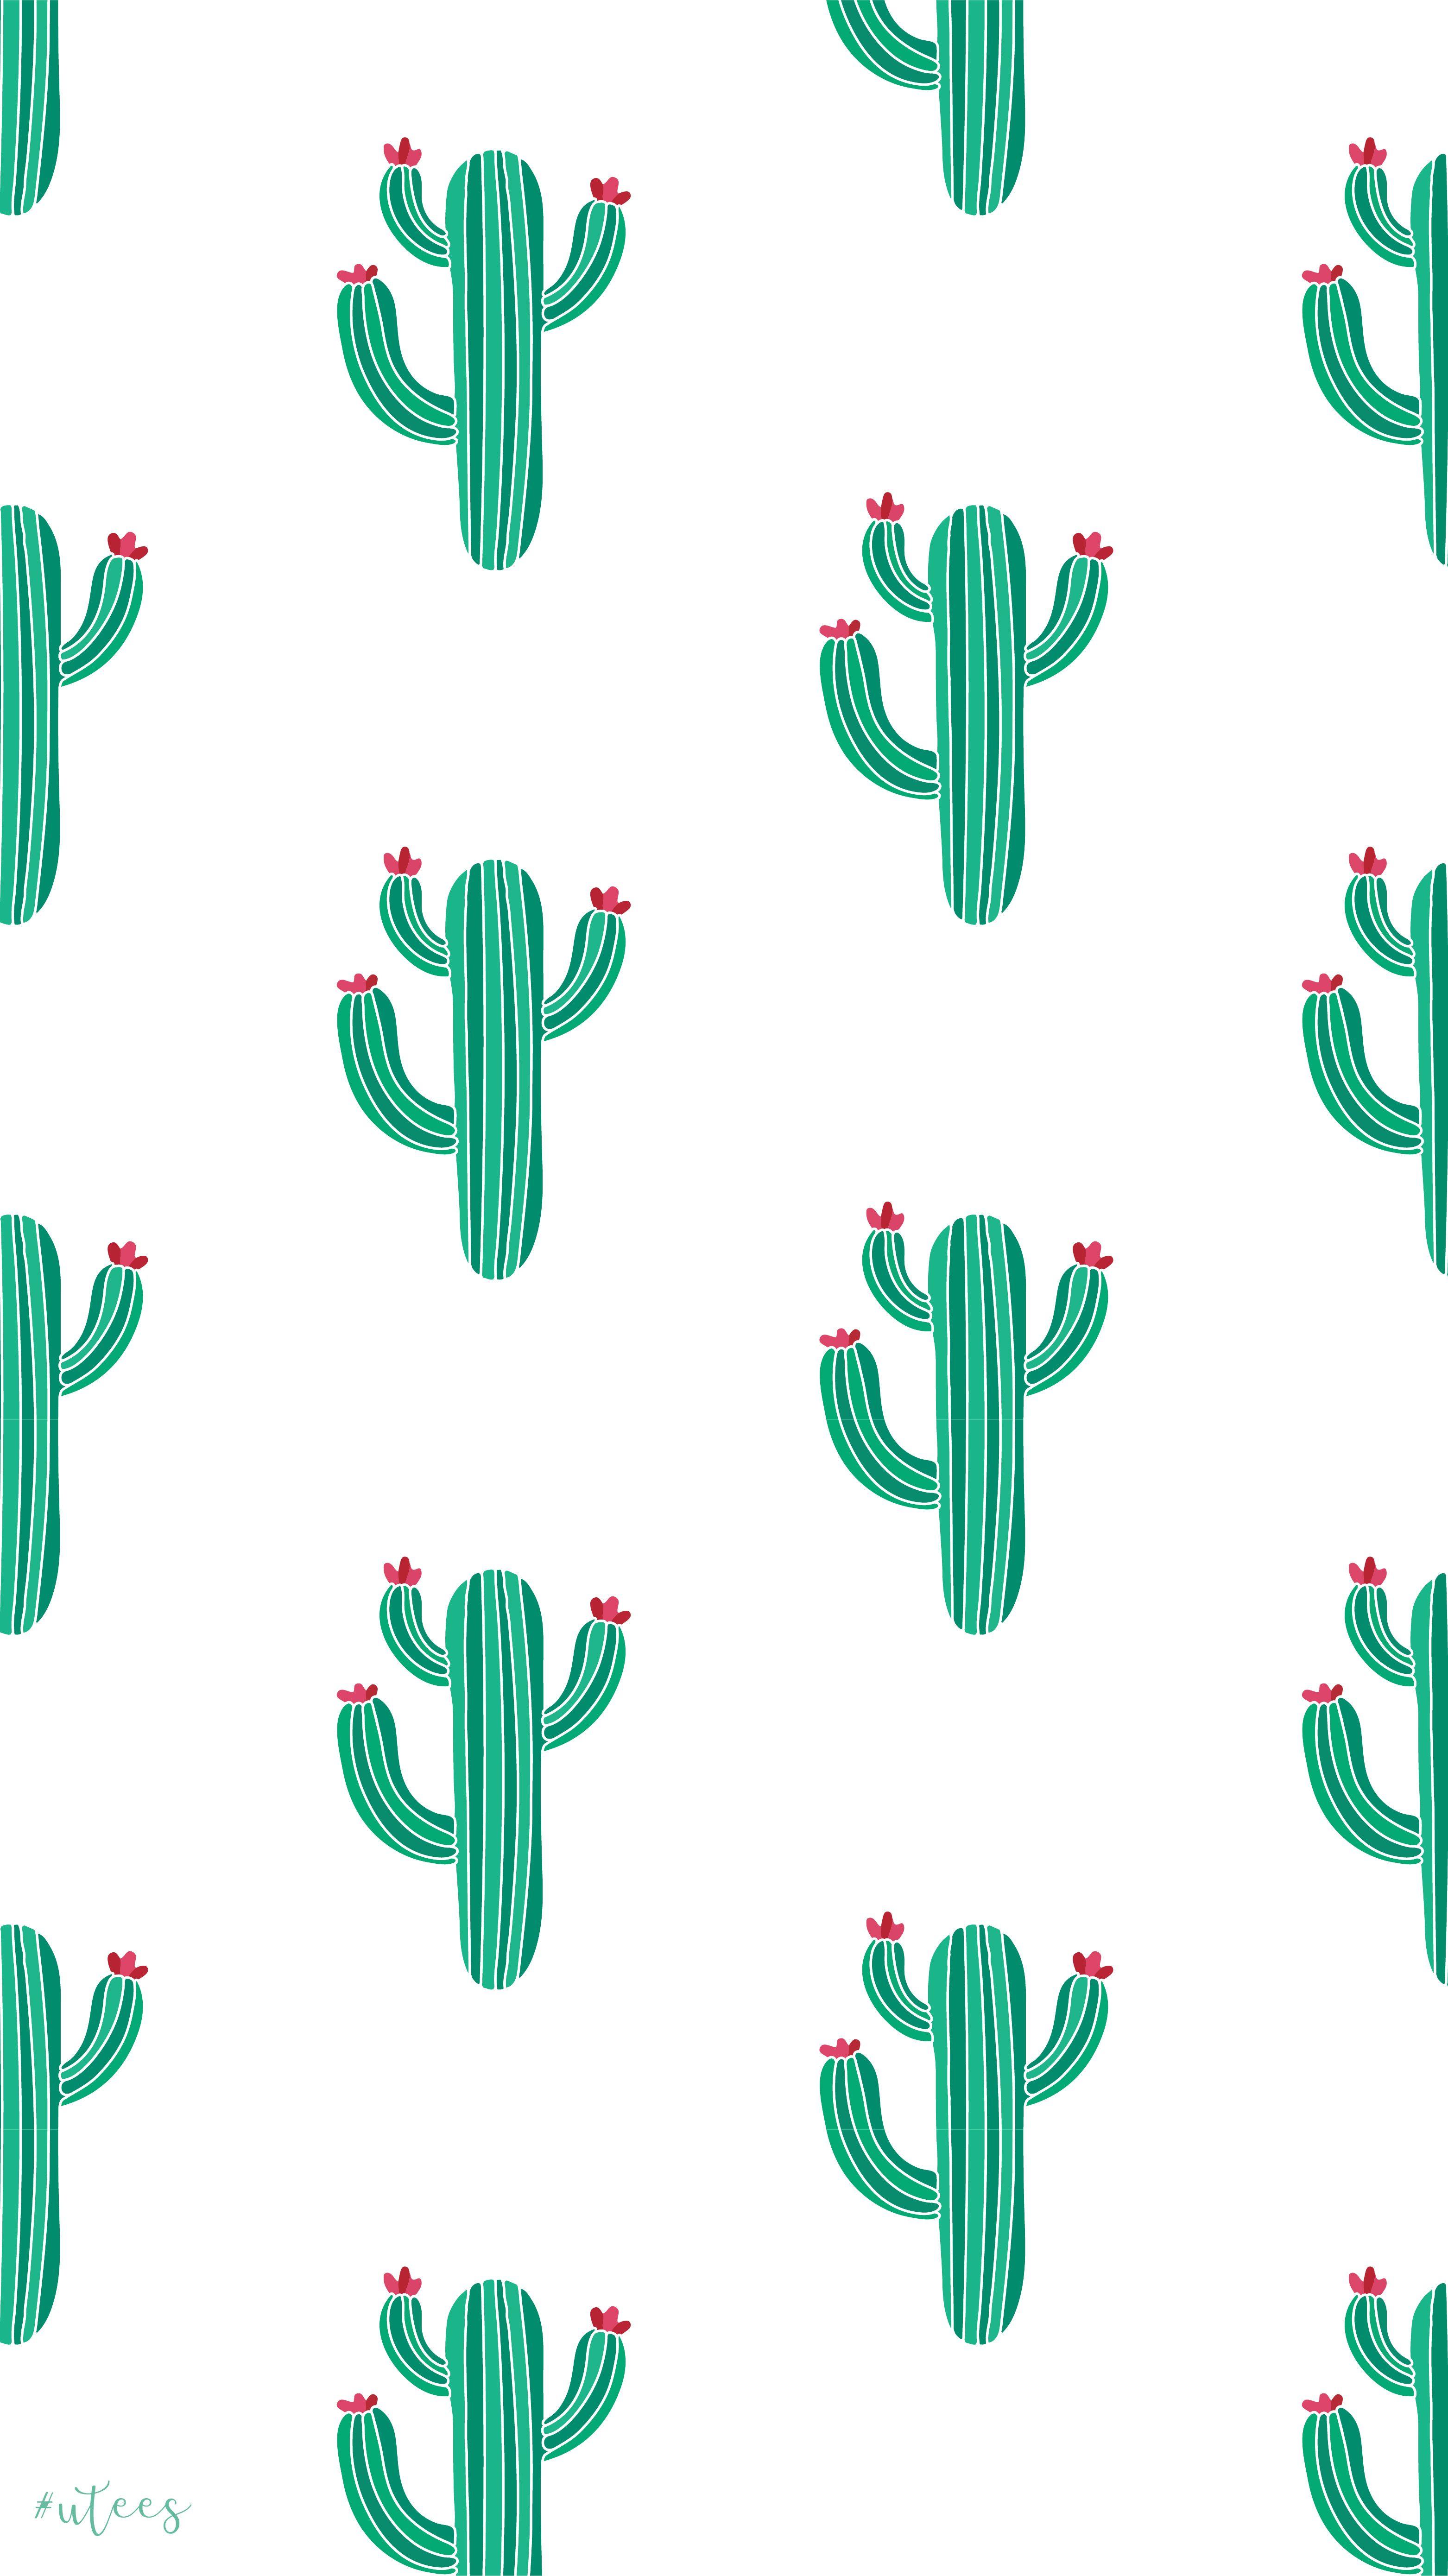 Cactus Wallpaper Design I Made By University Tees Design Team Cute Wallpaper For Phone Cute Patterns Wallpaper Wallpaper Iphone Cute